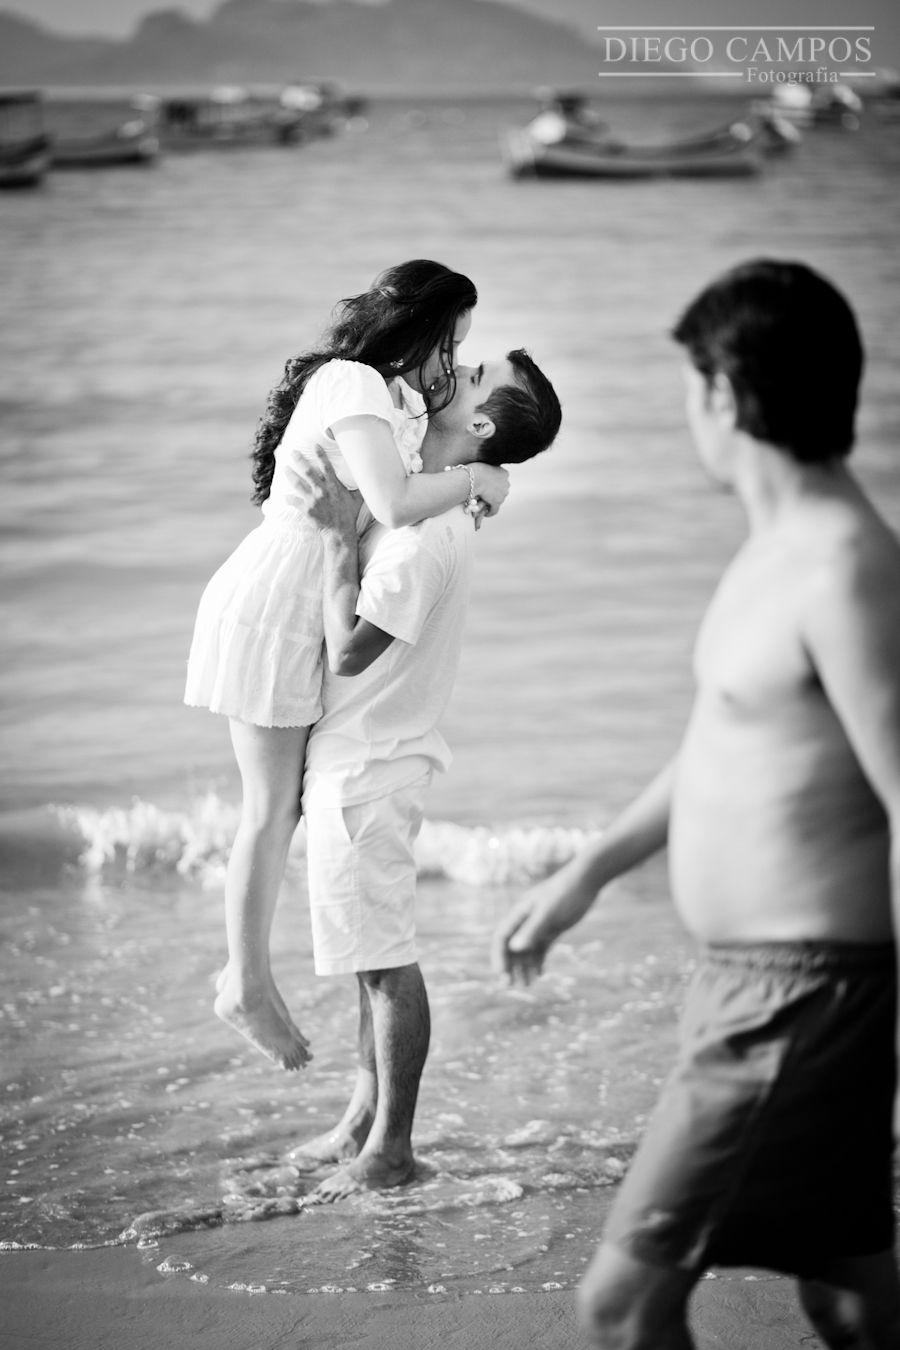 fotos de casamento na praia - Pesquisa Google